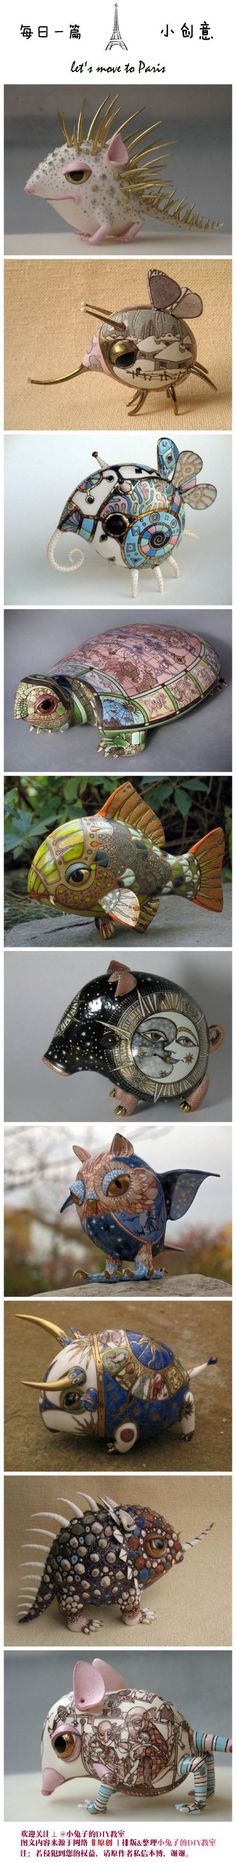 ceramic art from Russia